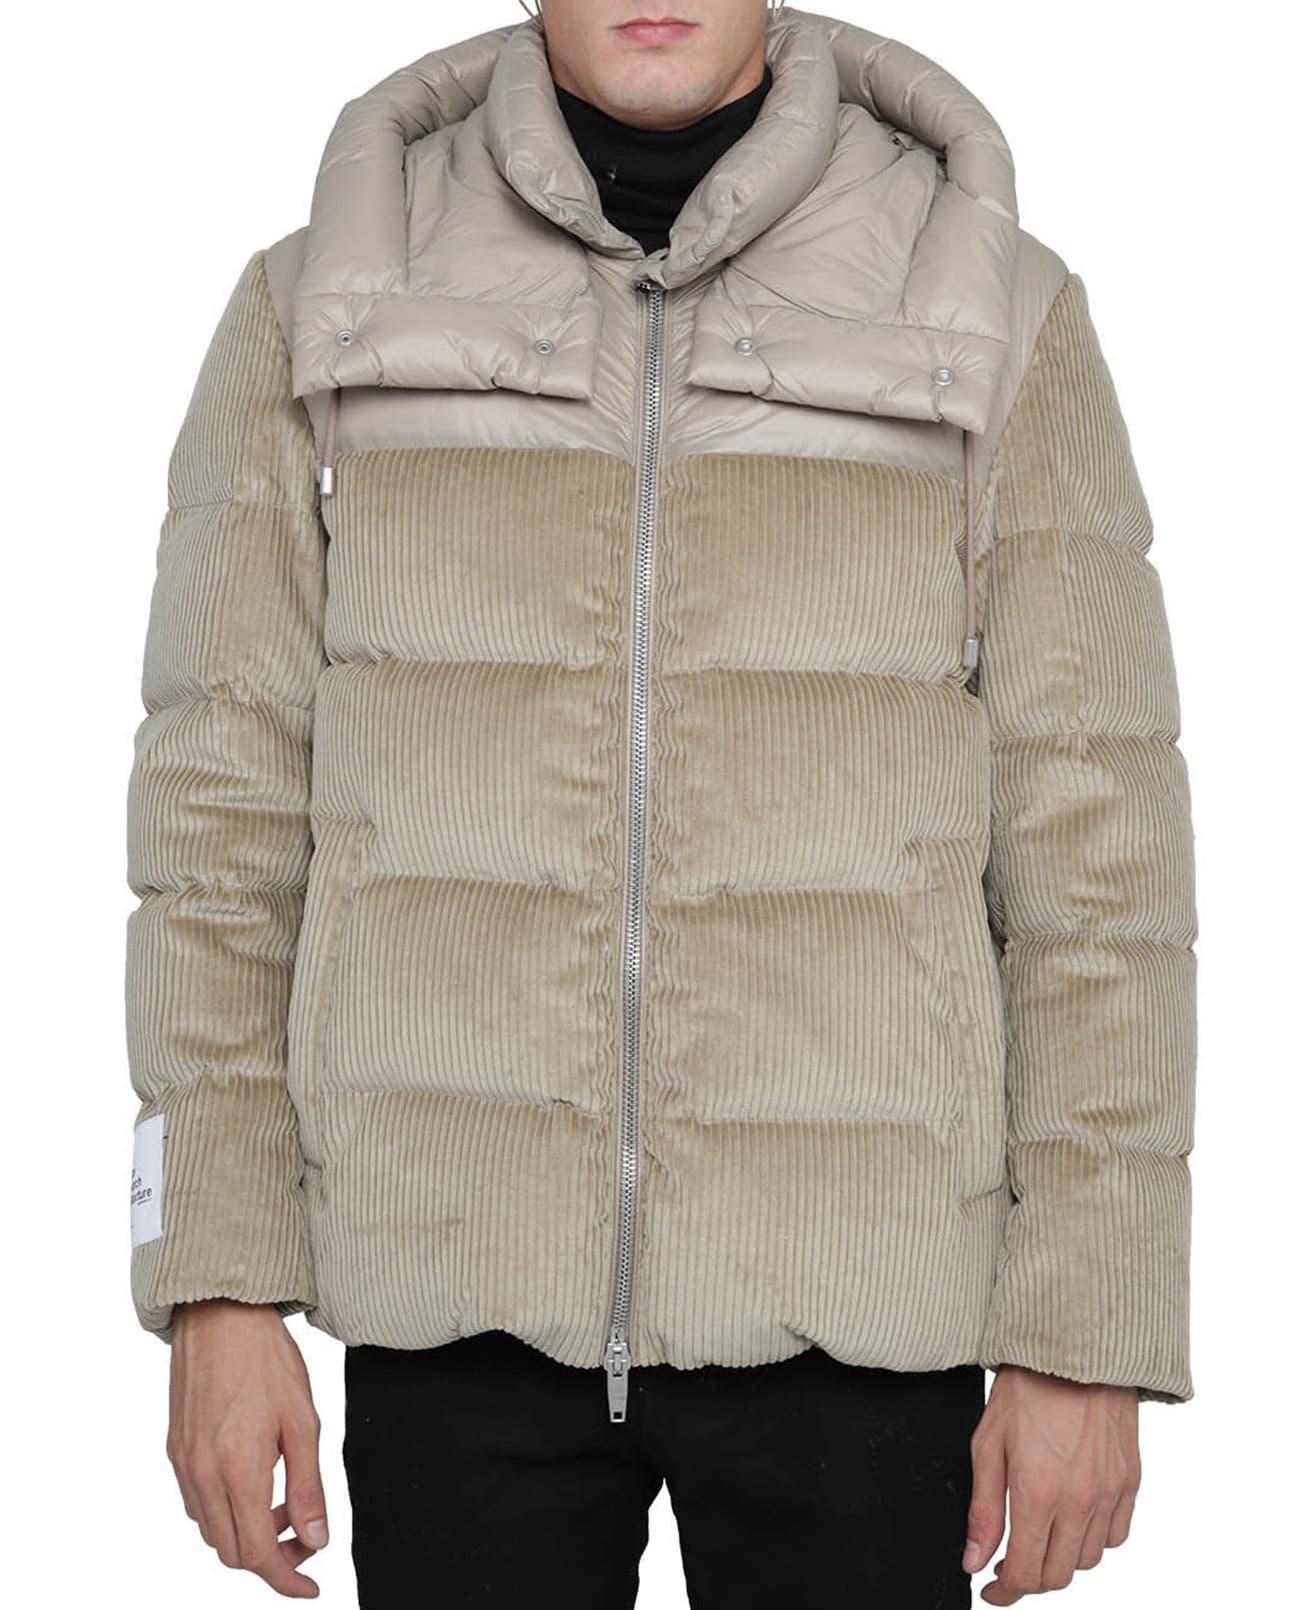 Beige Hybrid Puffer Jacket